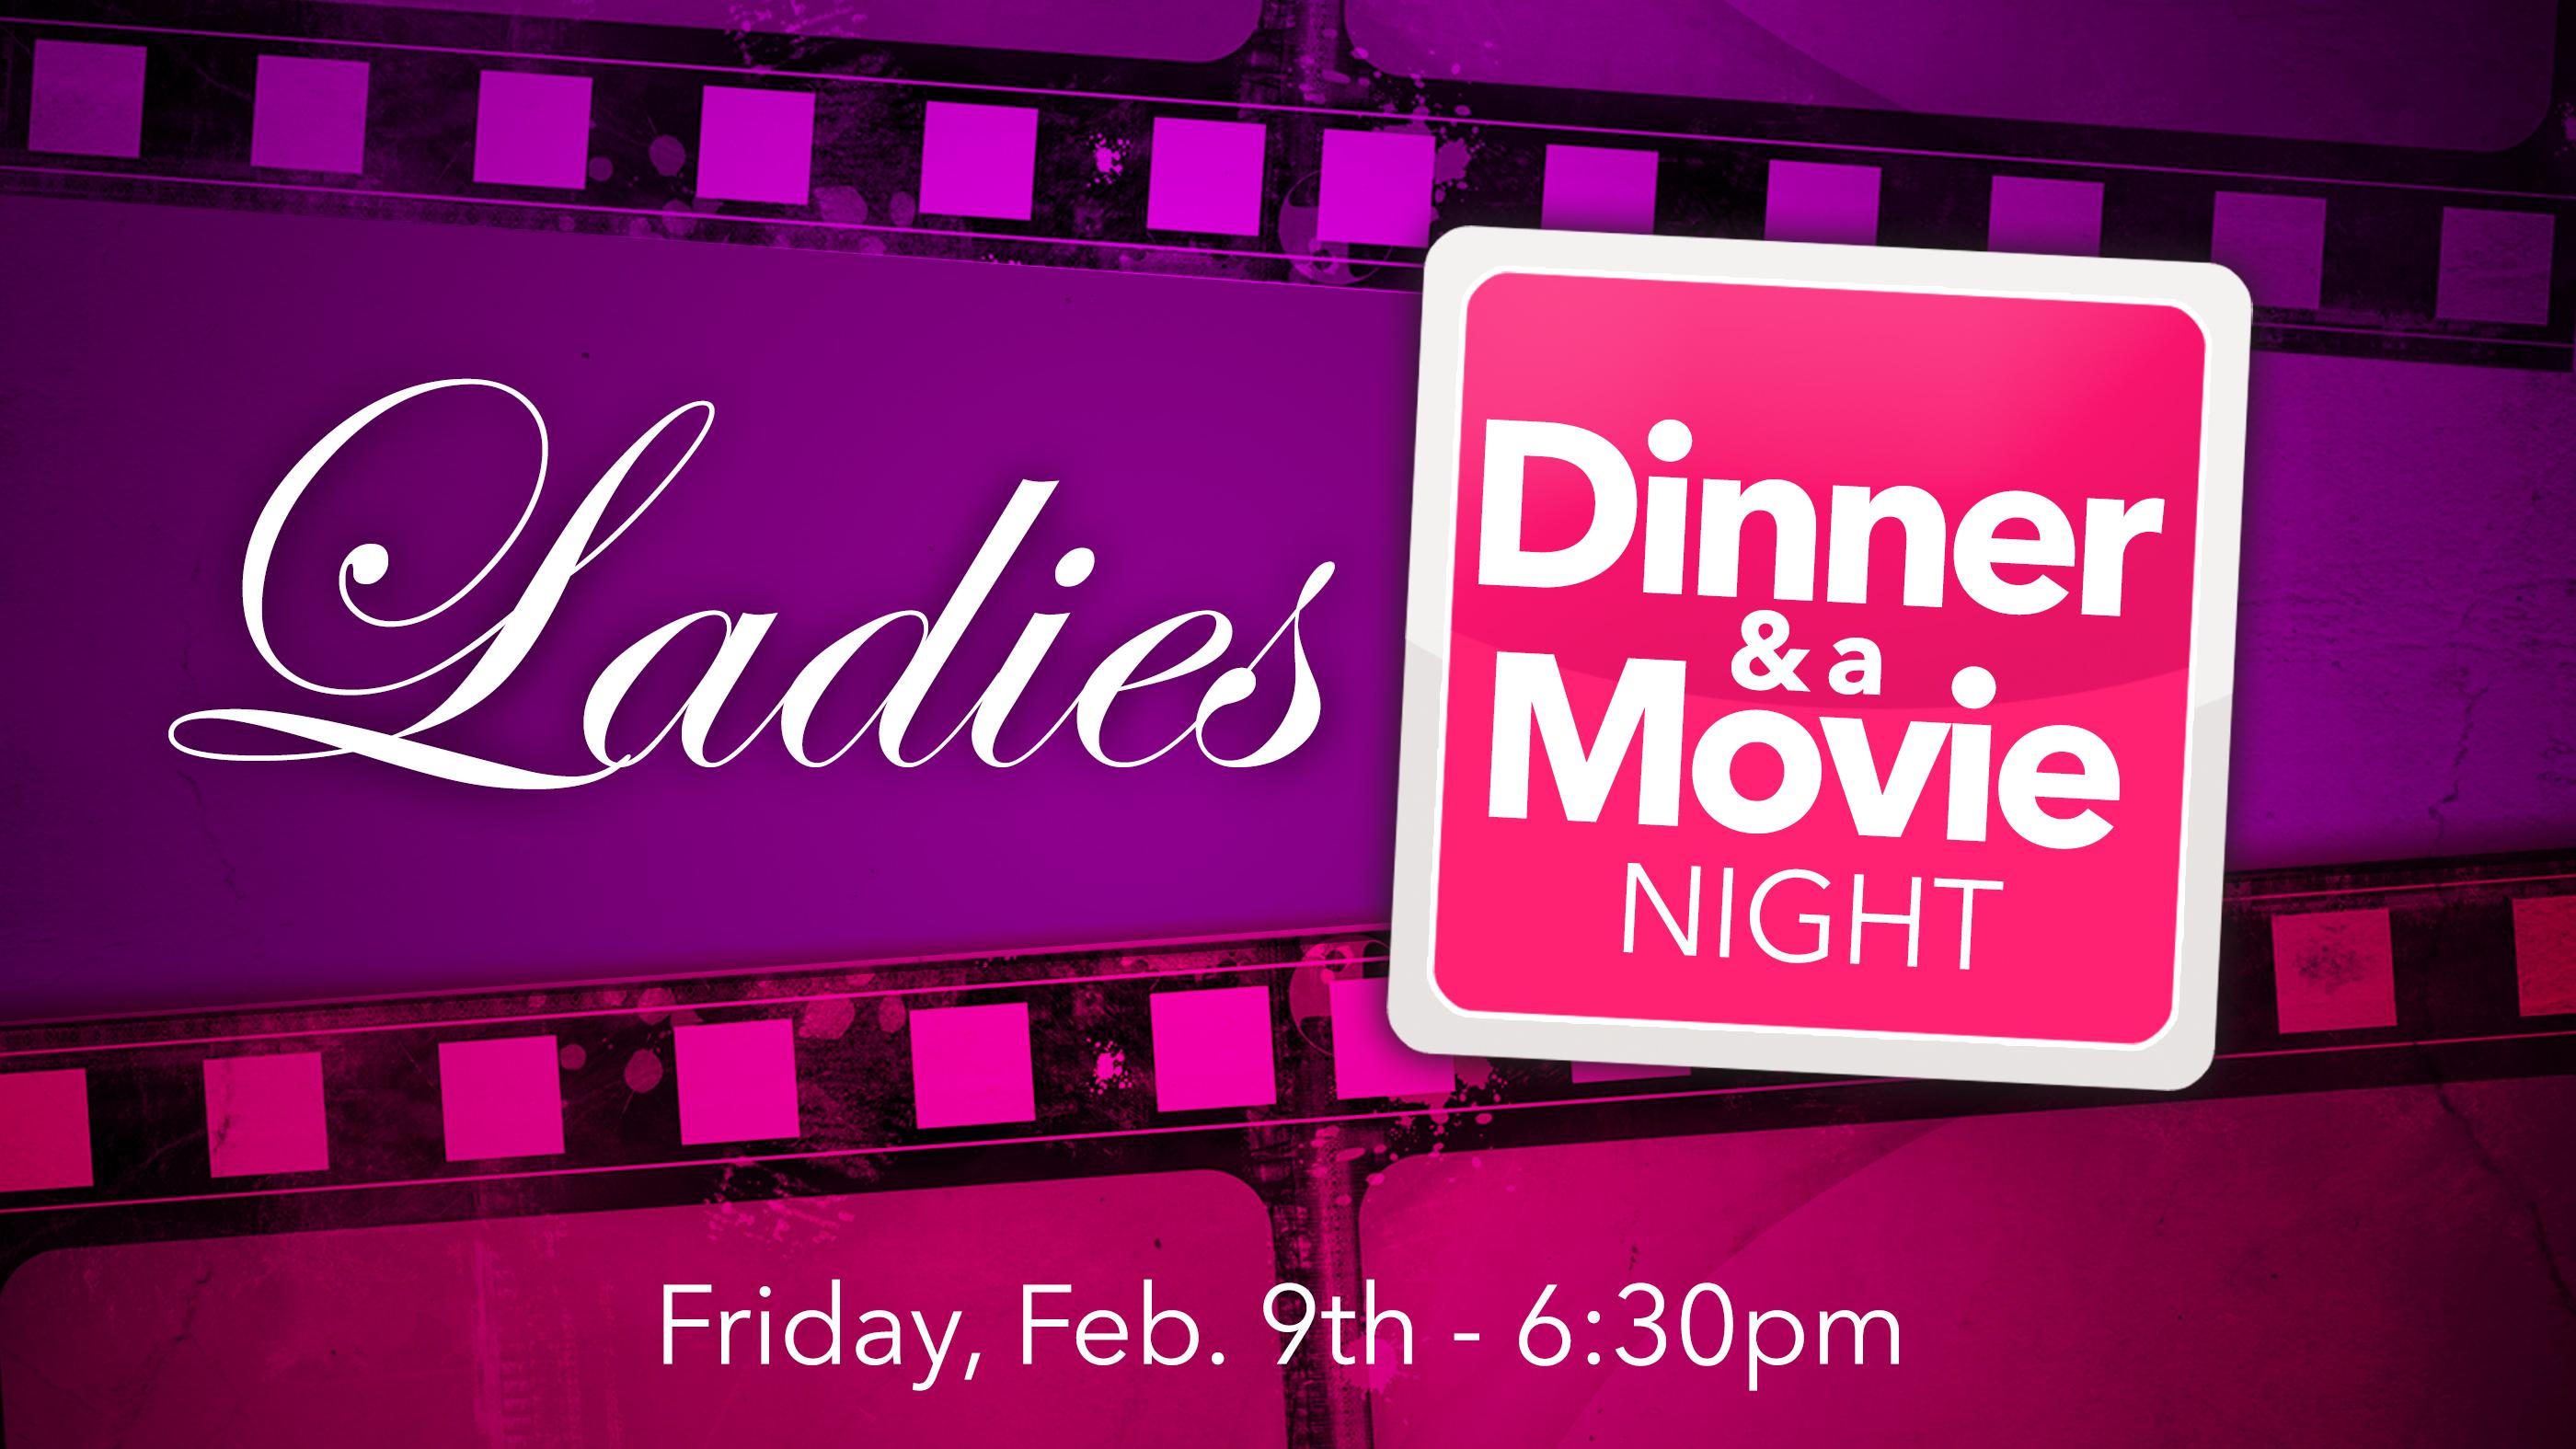 Ladeis dinner and movie